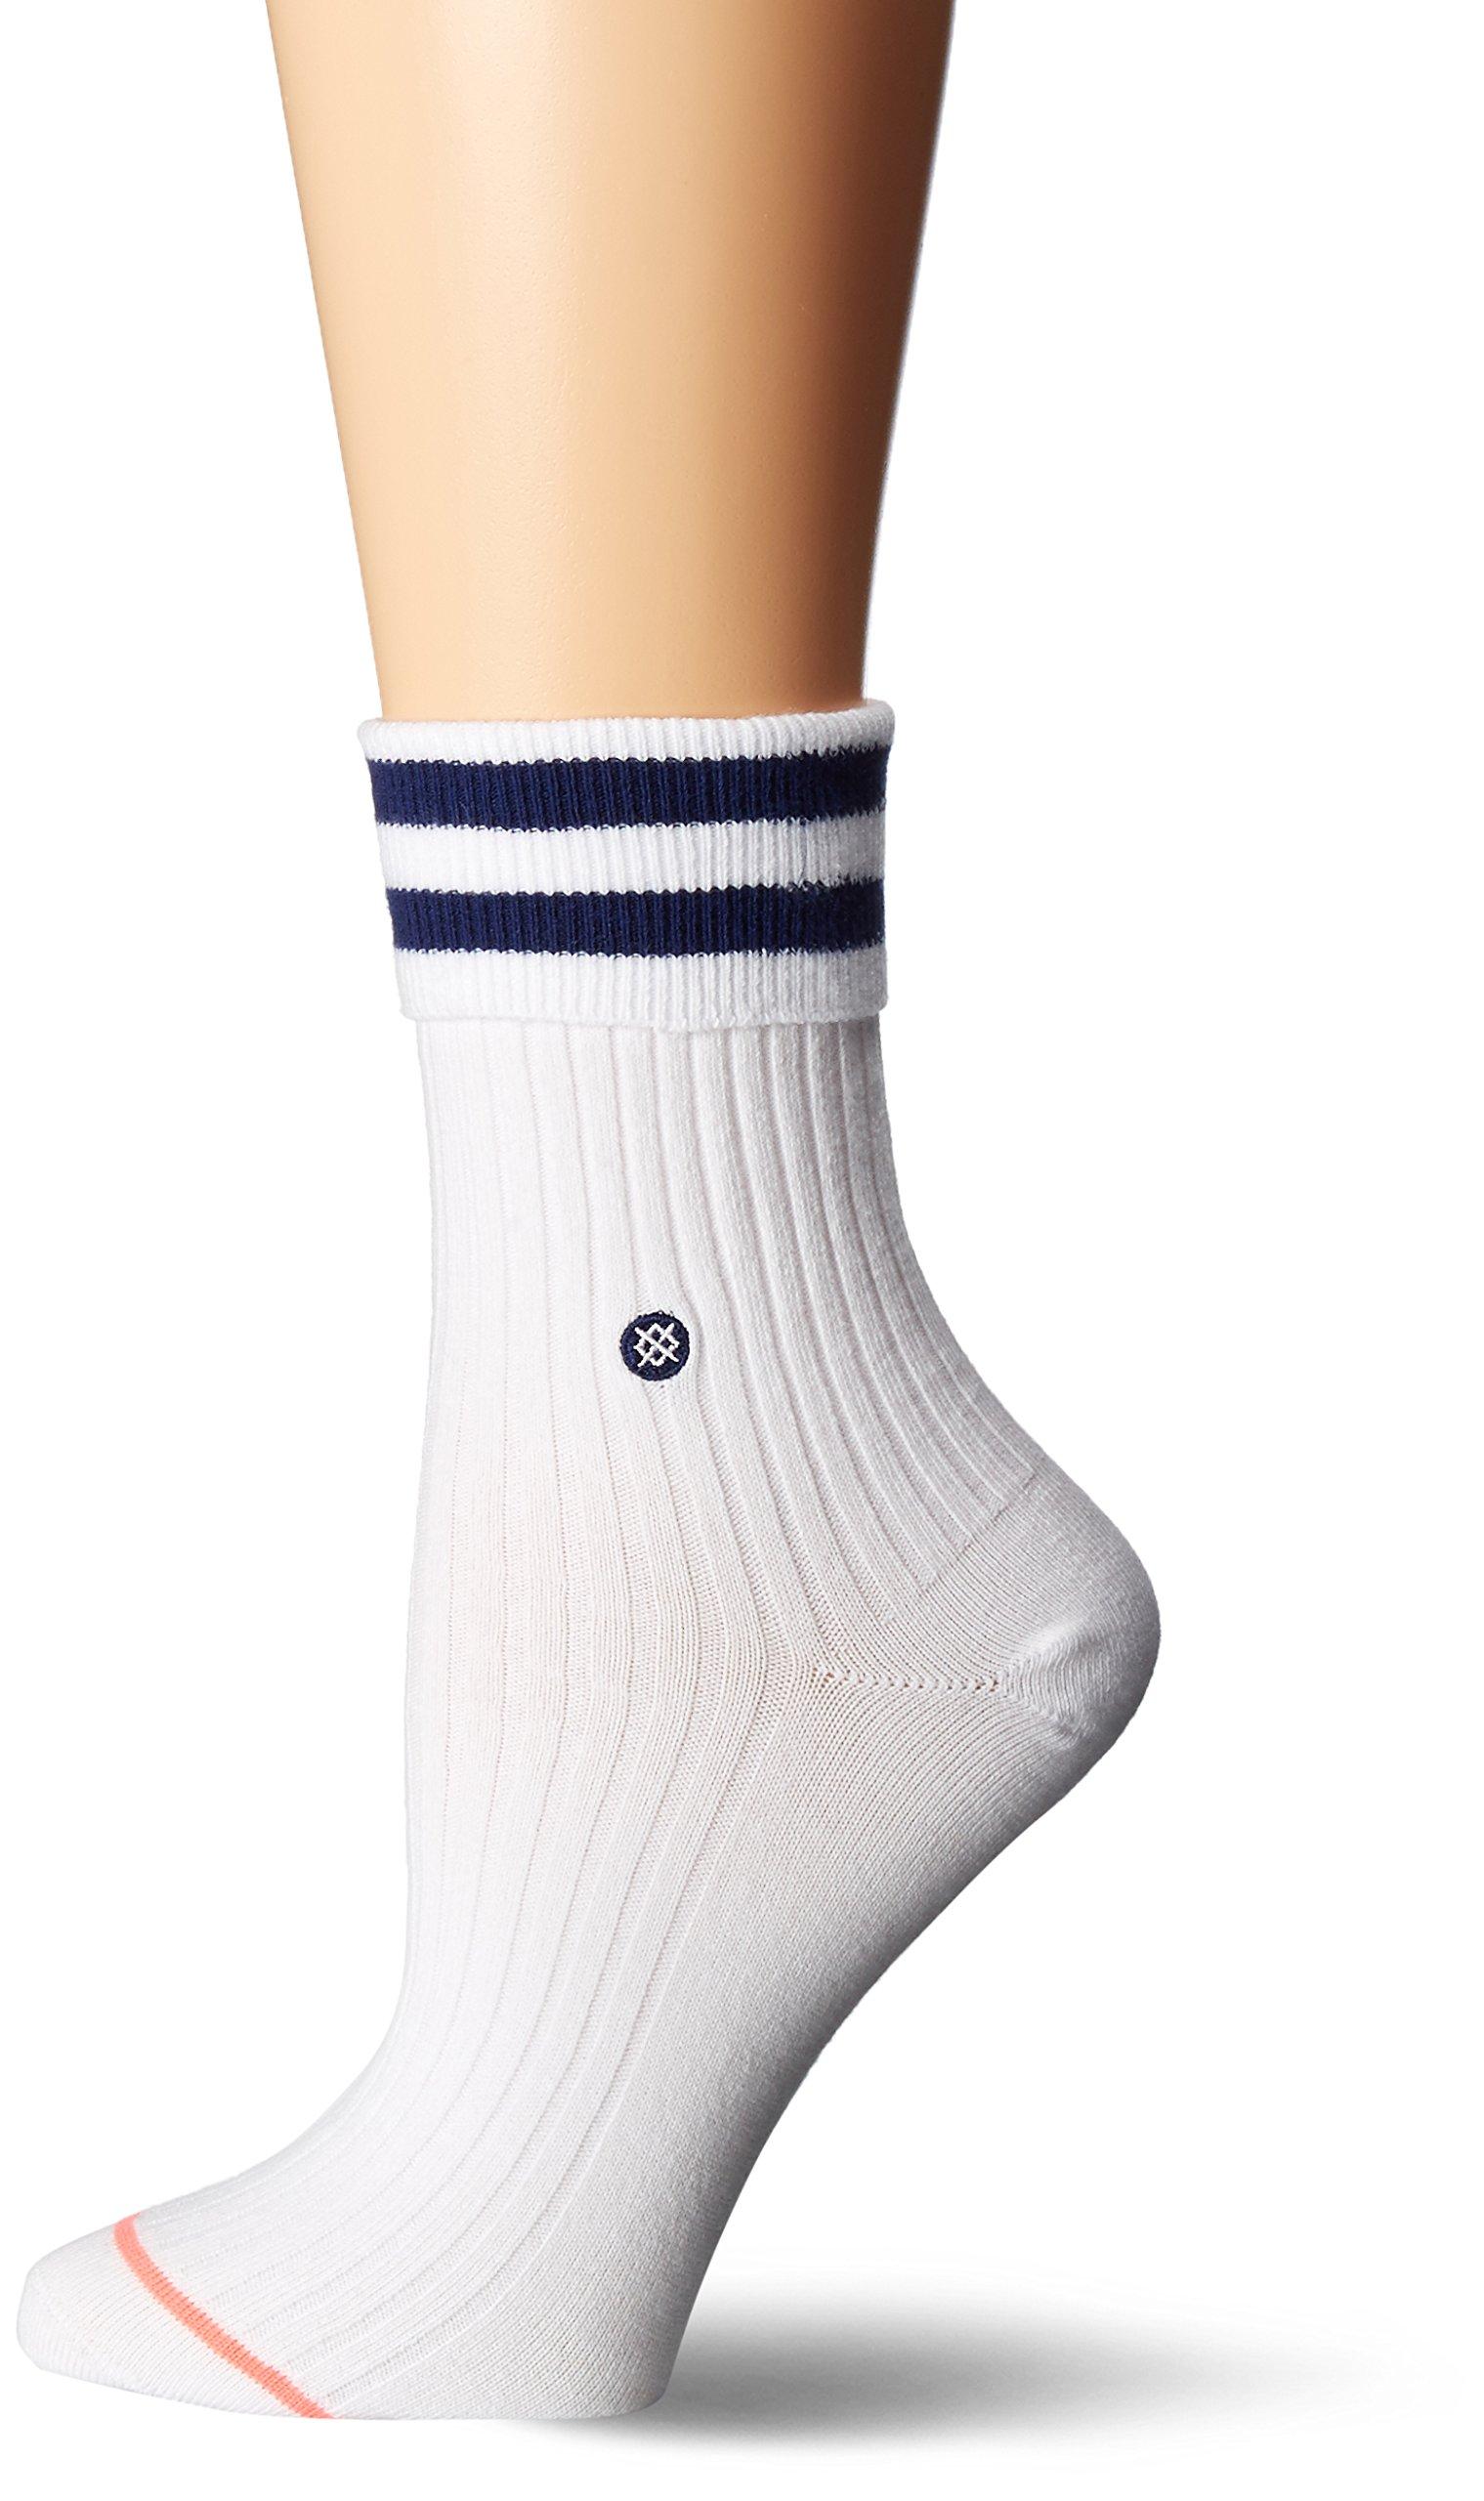 Stance Women's Uncommon Anklet, White, Medium